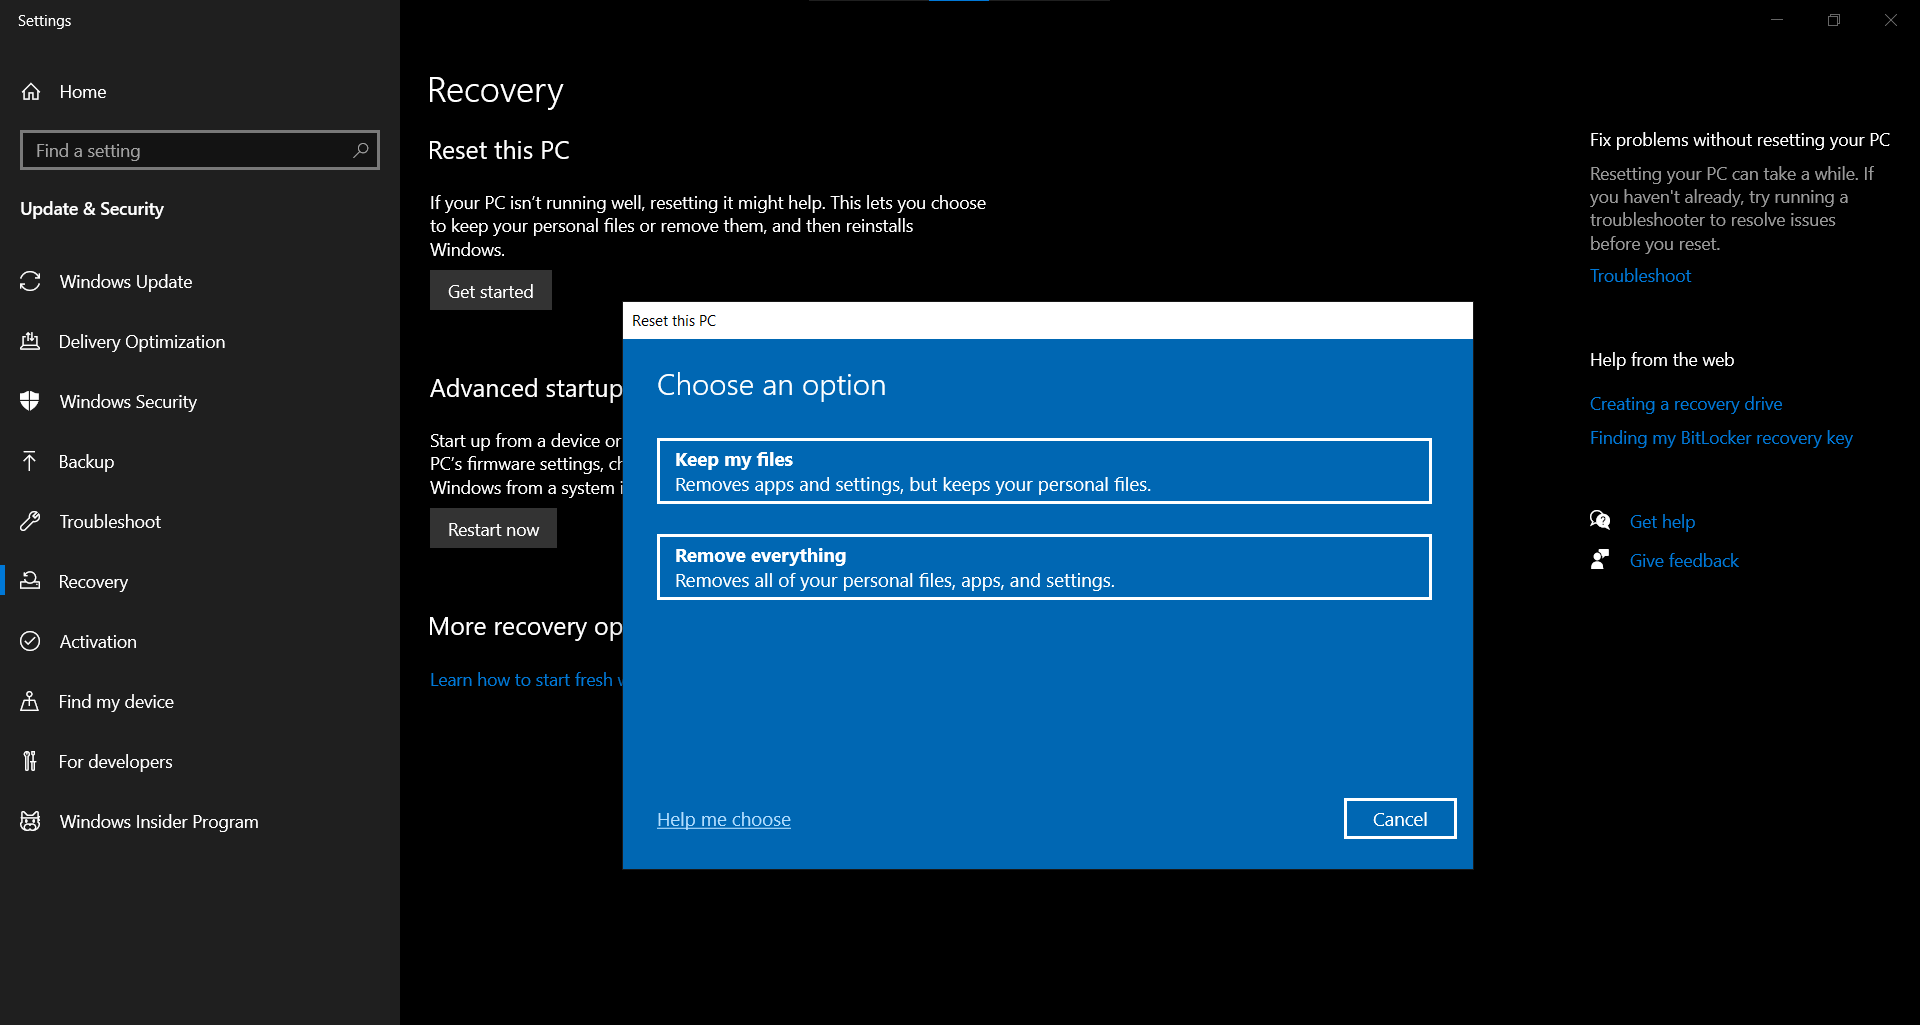 Fix WHEA Uncorrectable Error (0x0000124) by Resetting Windows 10 PC